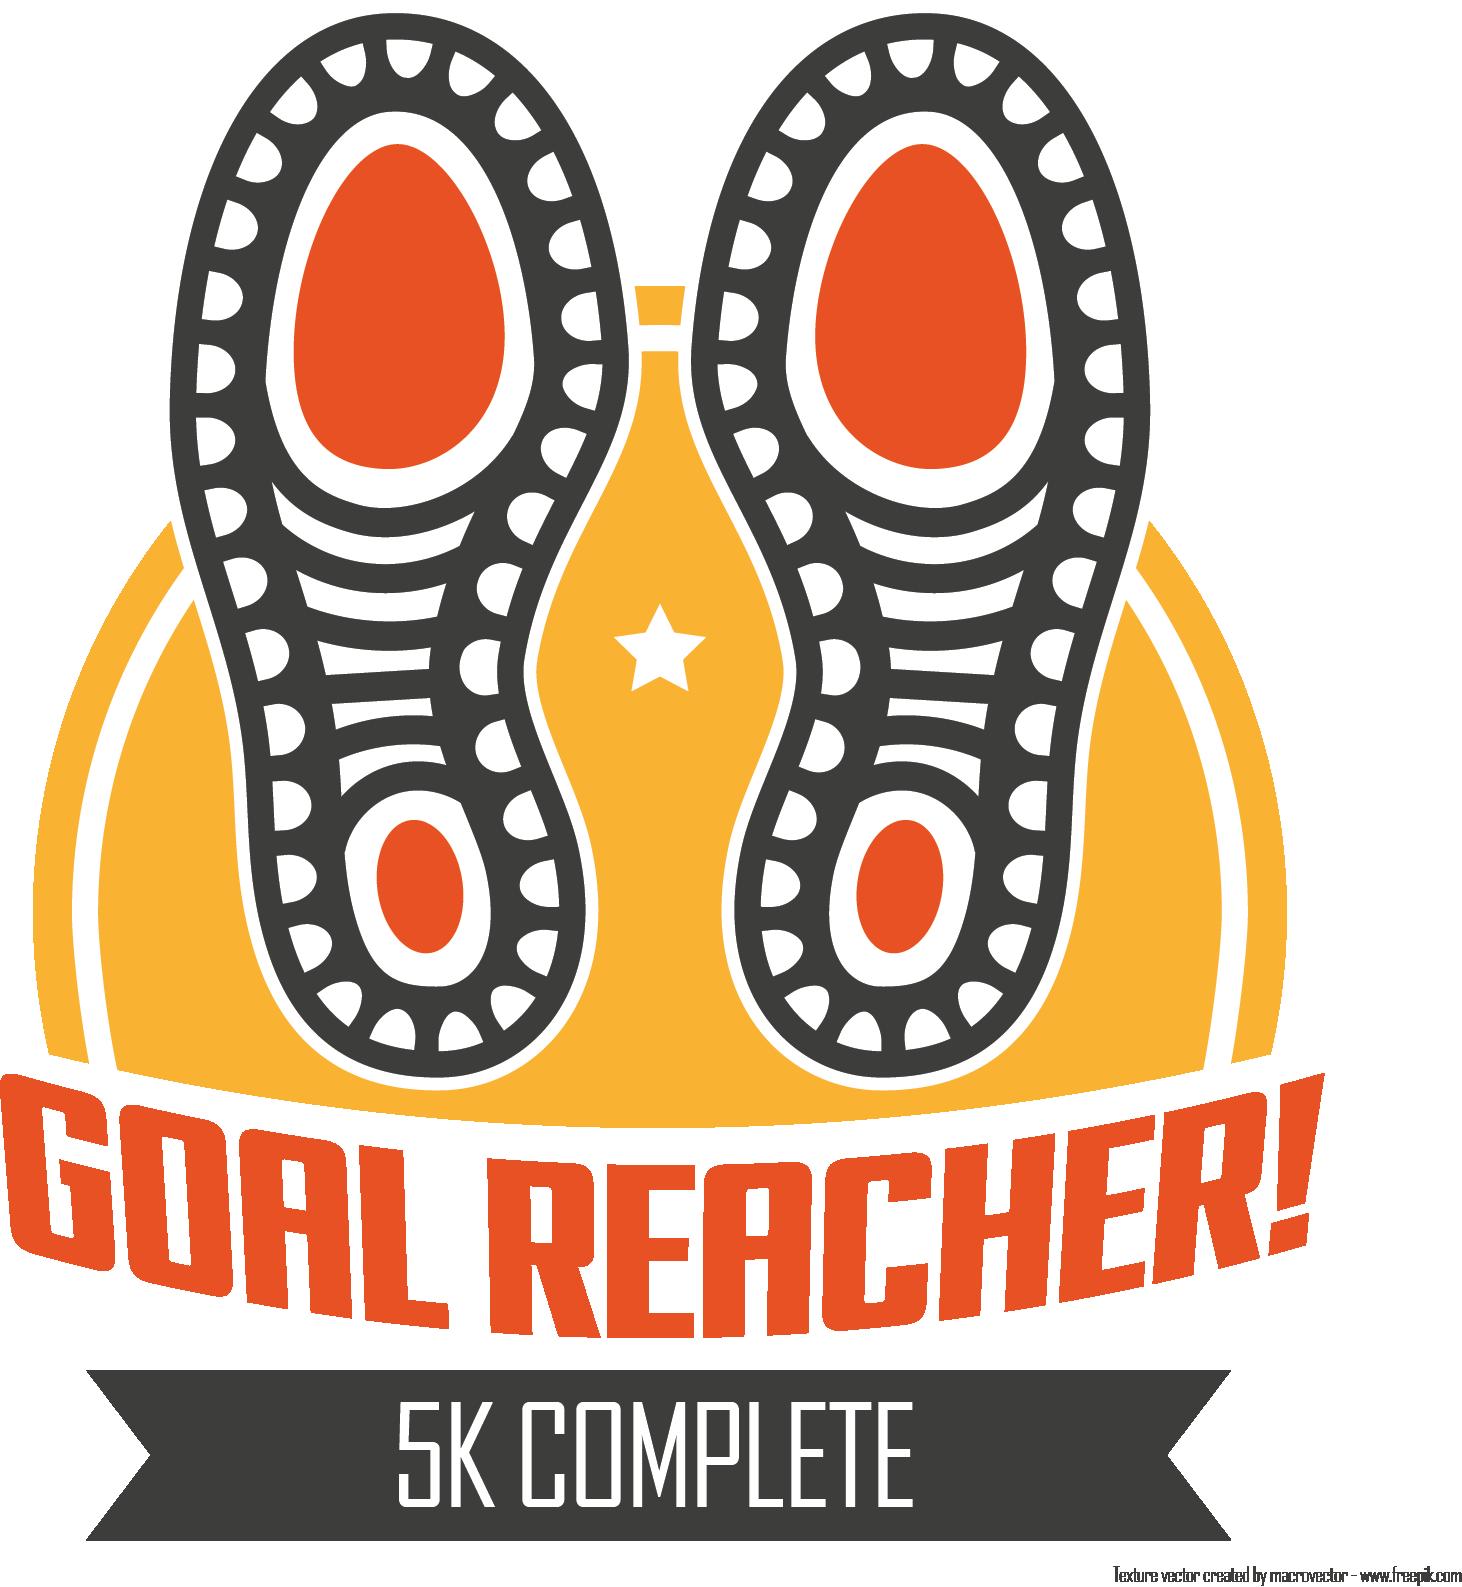 Goal Reacher Badge (5k)